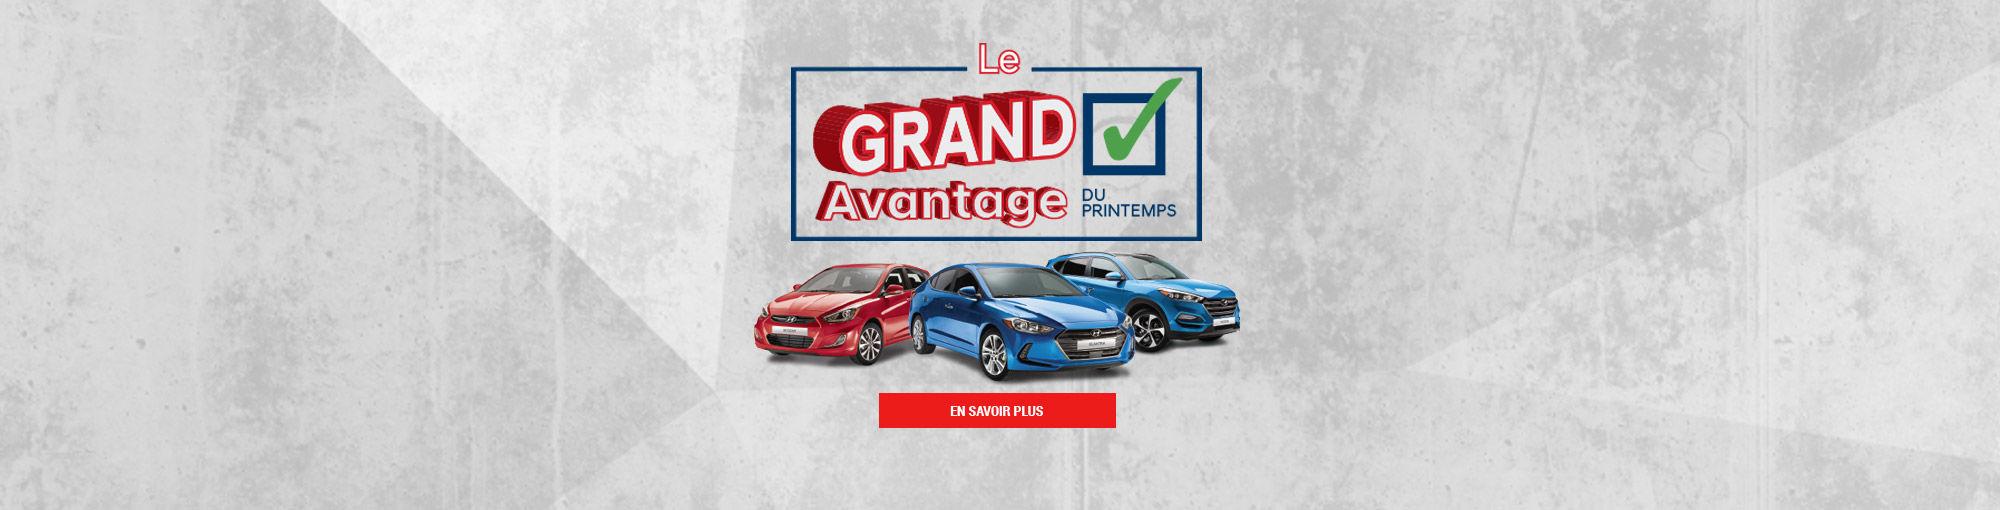 Grand Avantage Printemps 2018 Main Header Avril 2018